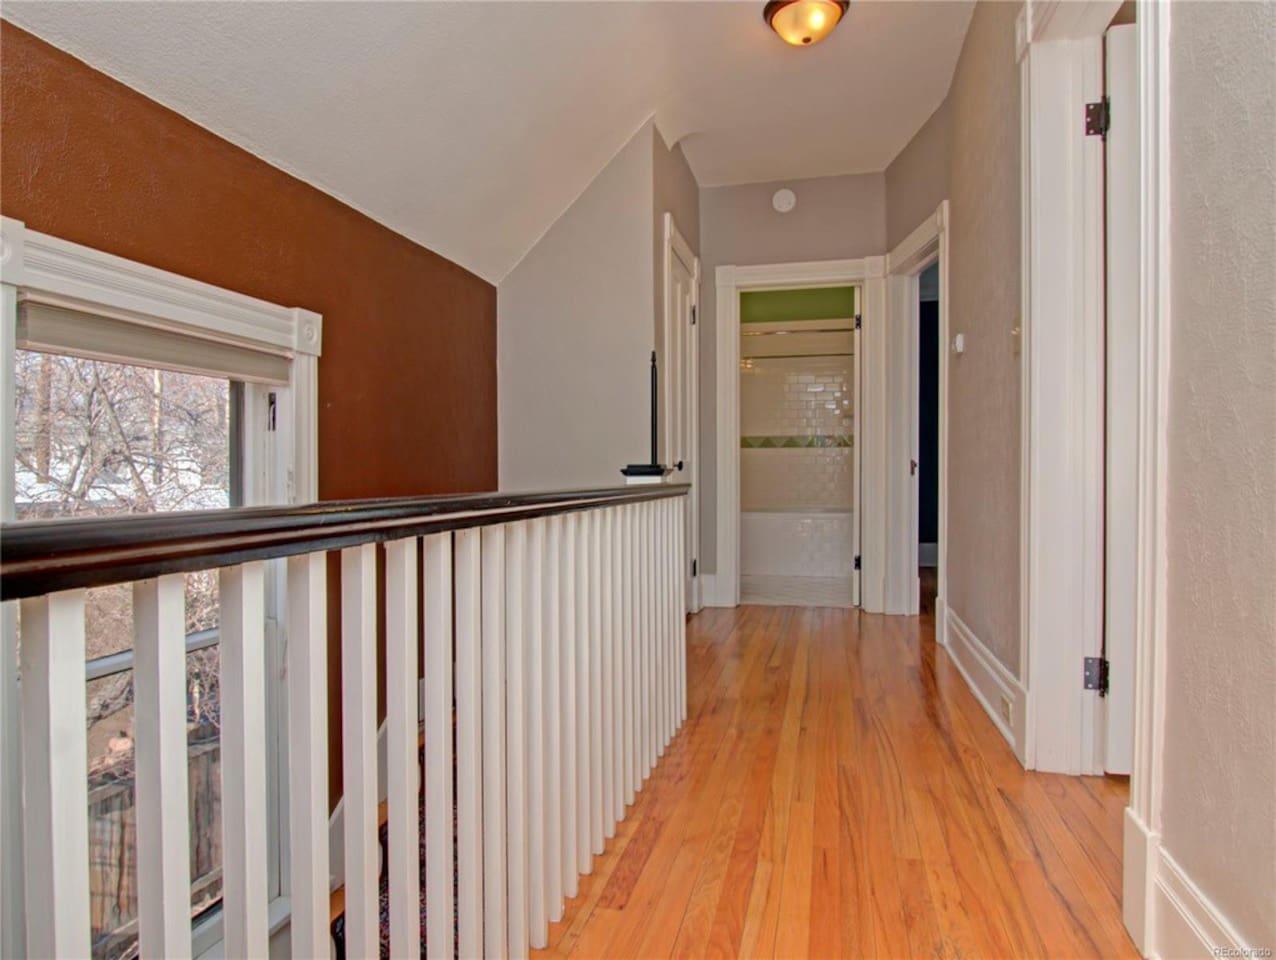 The upstairs hallway.